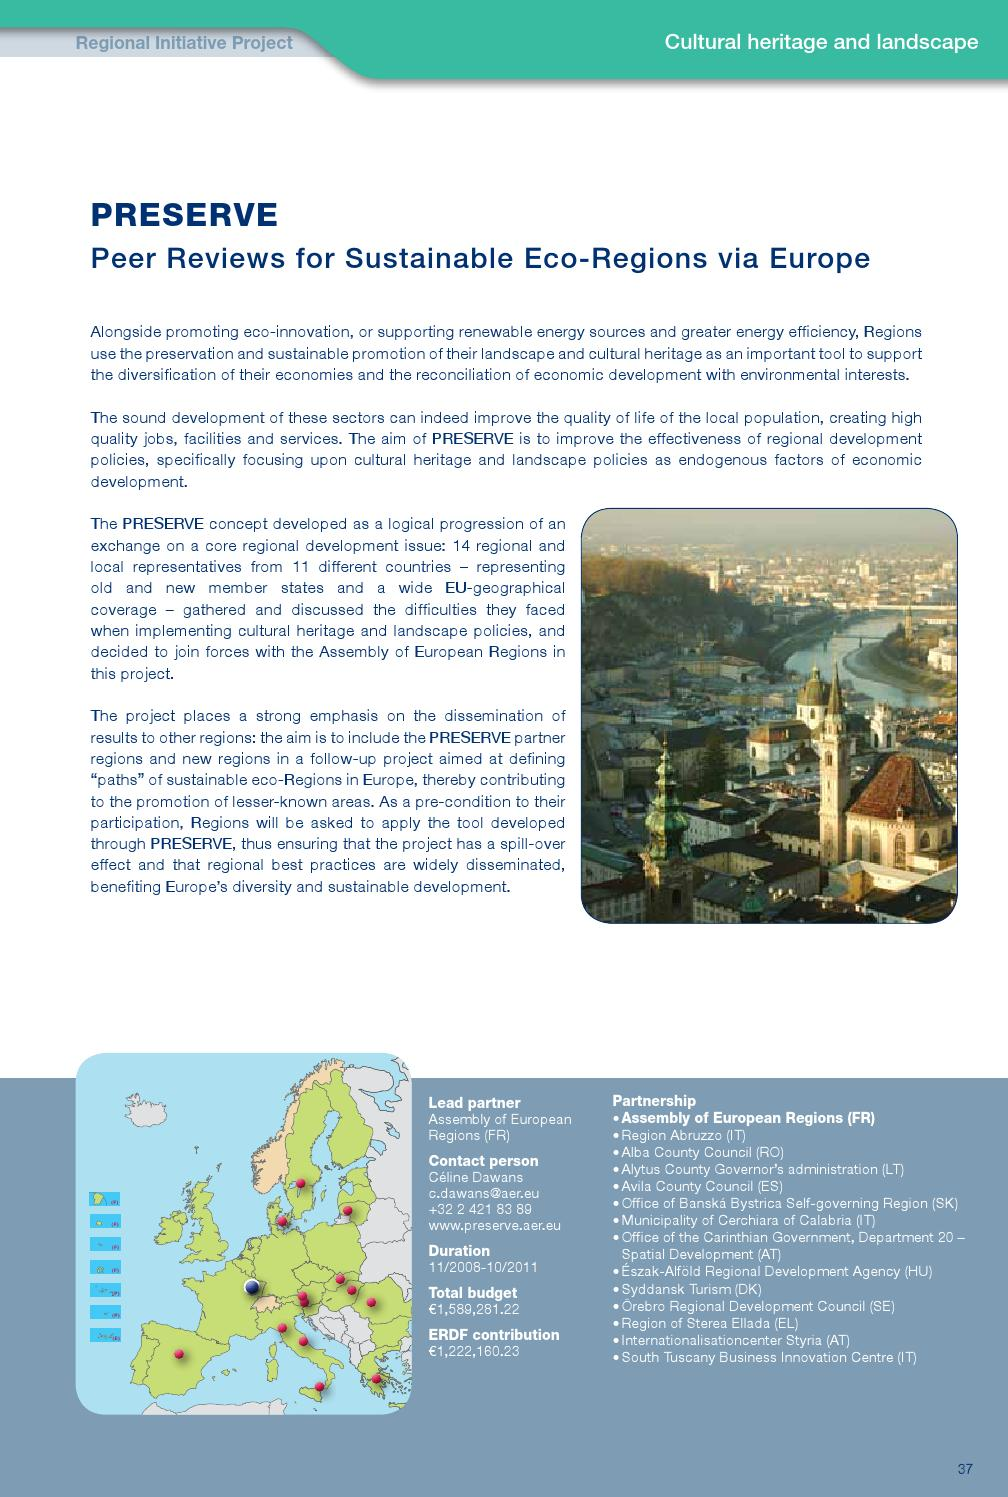 INTERREG IVC Interregional Cooperation Projects: First